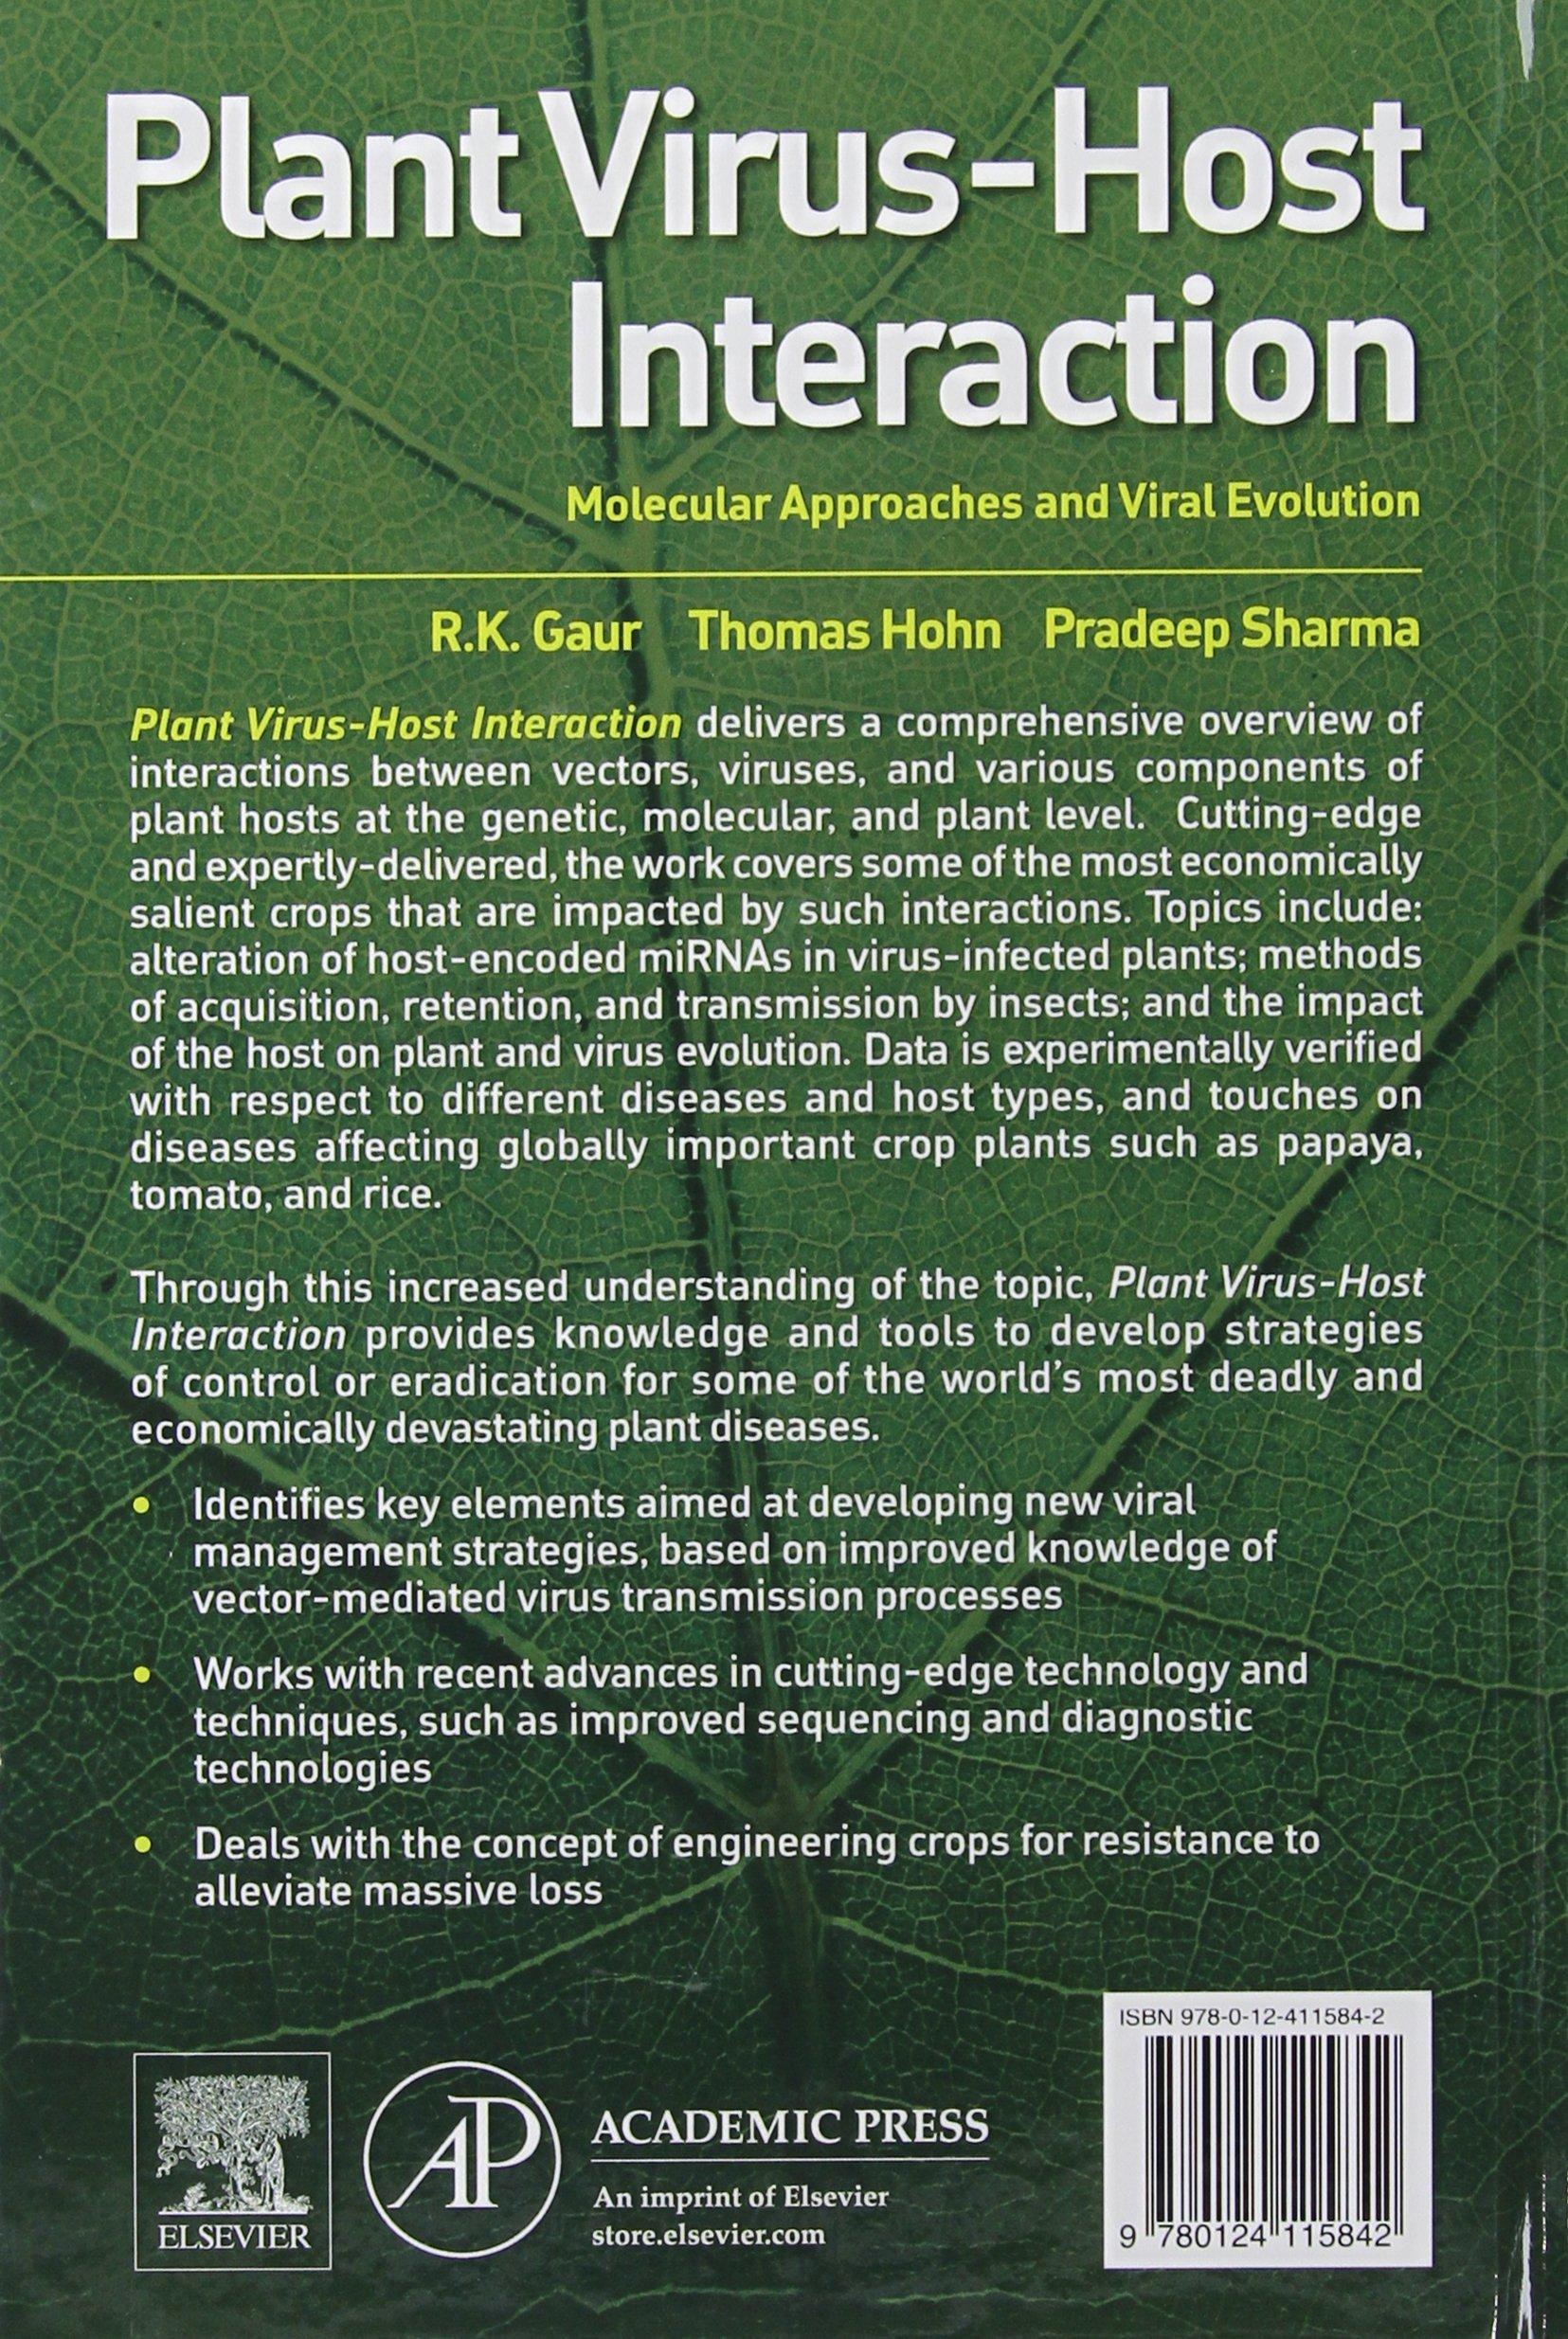 Plant Virus-Host Interaction: Molecular Approaches and Viral Evolution: Amazon.es: Gaur, R.K., Hohn Professor, Thomas, Sharma, Pradeep: Libros en idiomas extranjeros